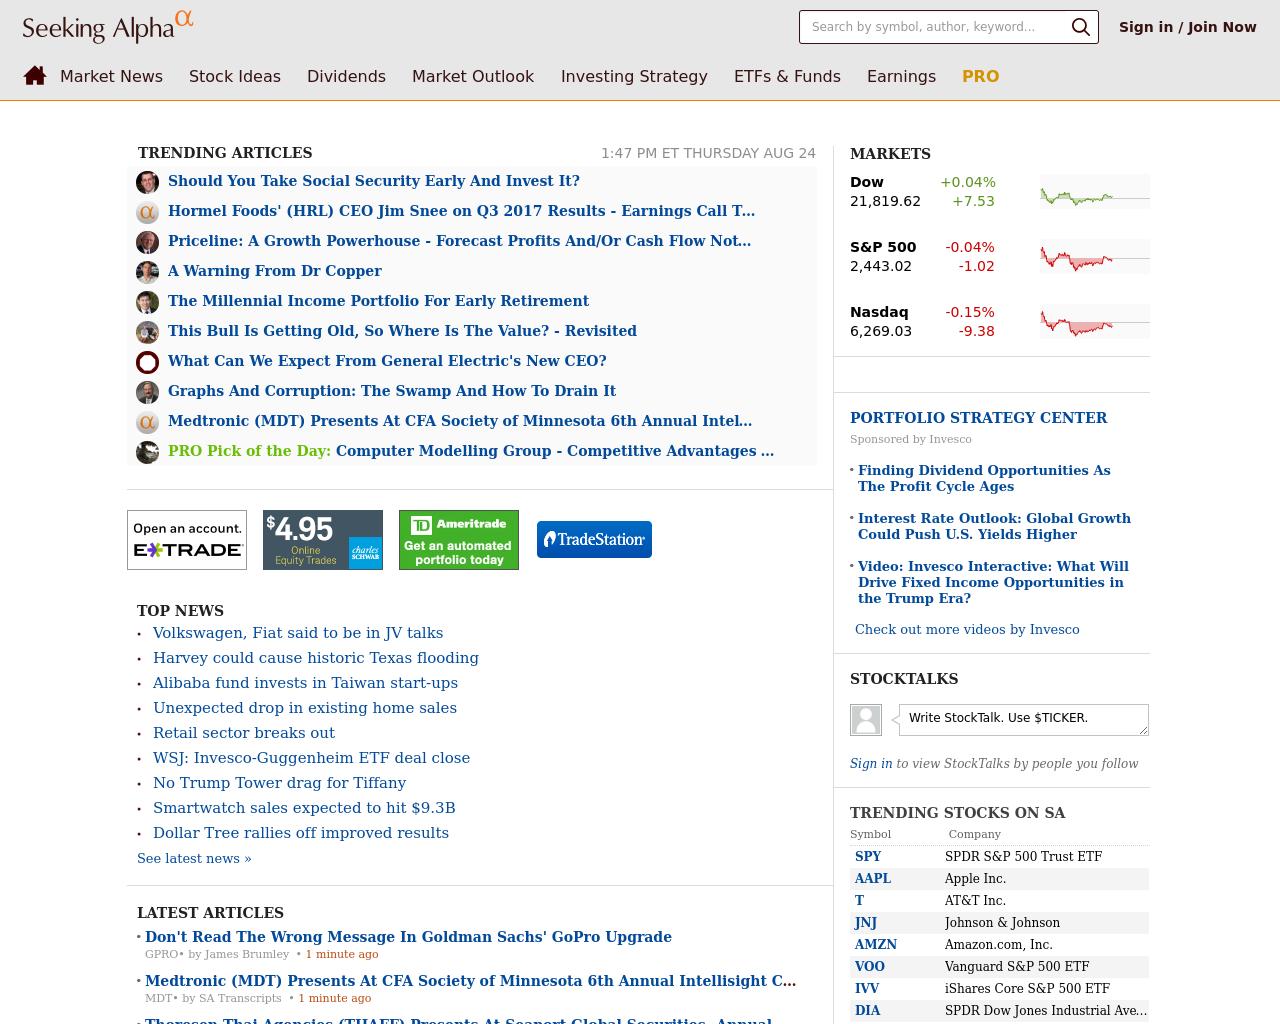 Seeking-Alpha-Advertising-Reviews-Pricing